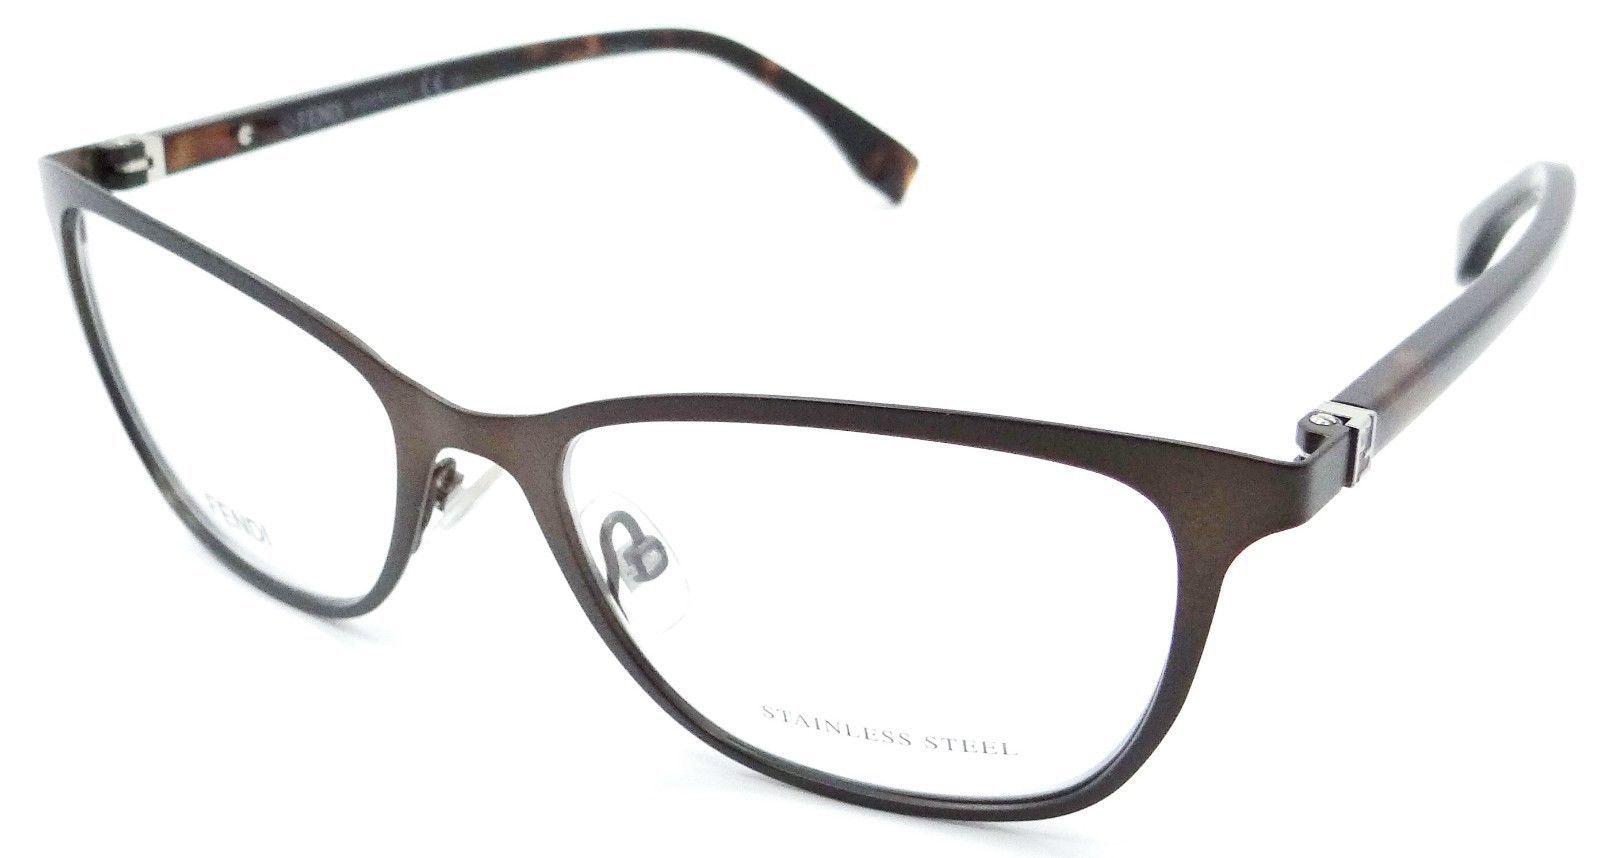 6ed8aafc476 Fendi Rx Eyeglasses Frames FF 0011 7SR and 50 similar items